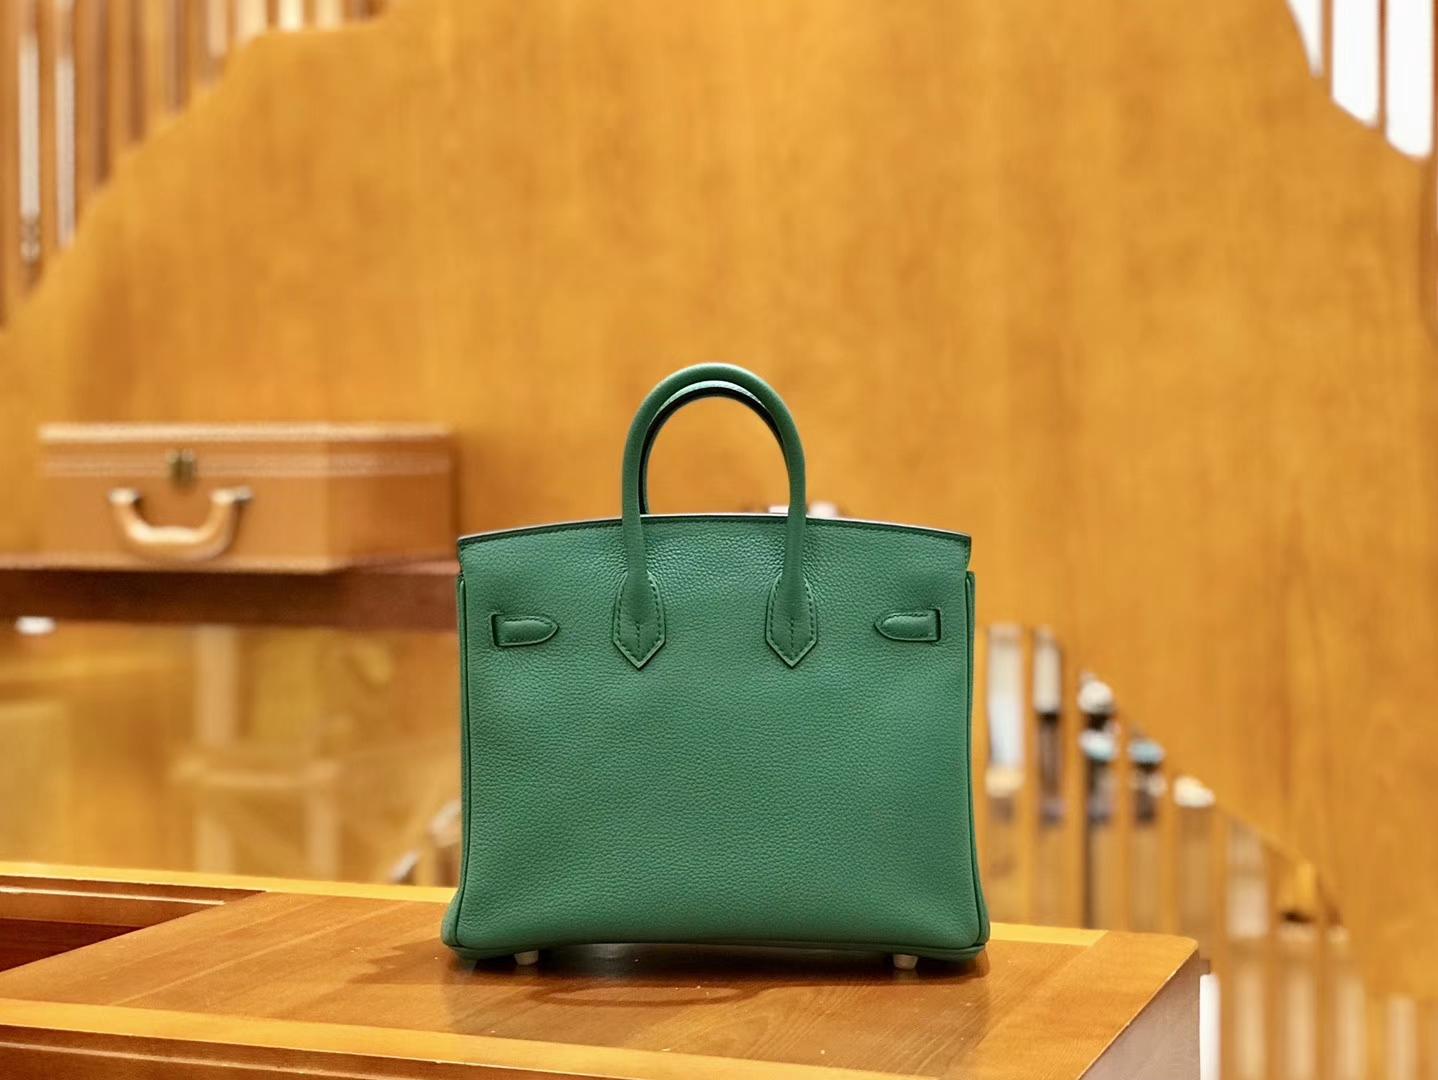 Hermès(爱马仕)Birkin 25cm 丝绒绿 金扣 全手工缝制